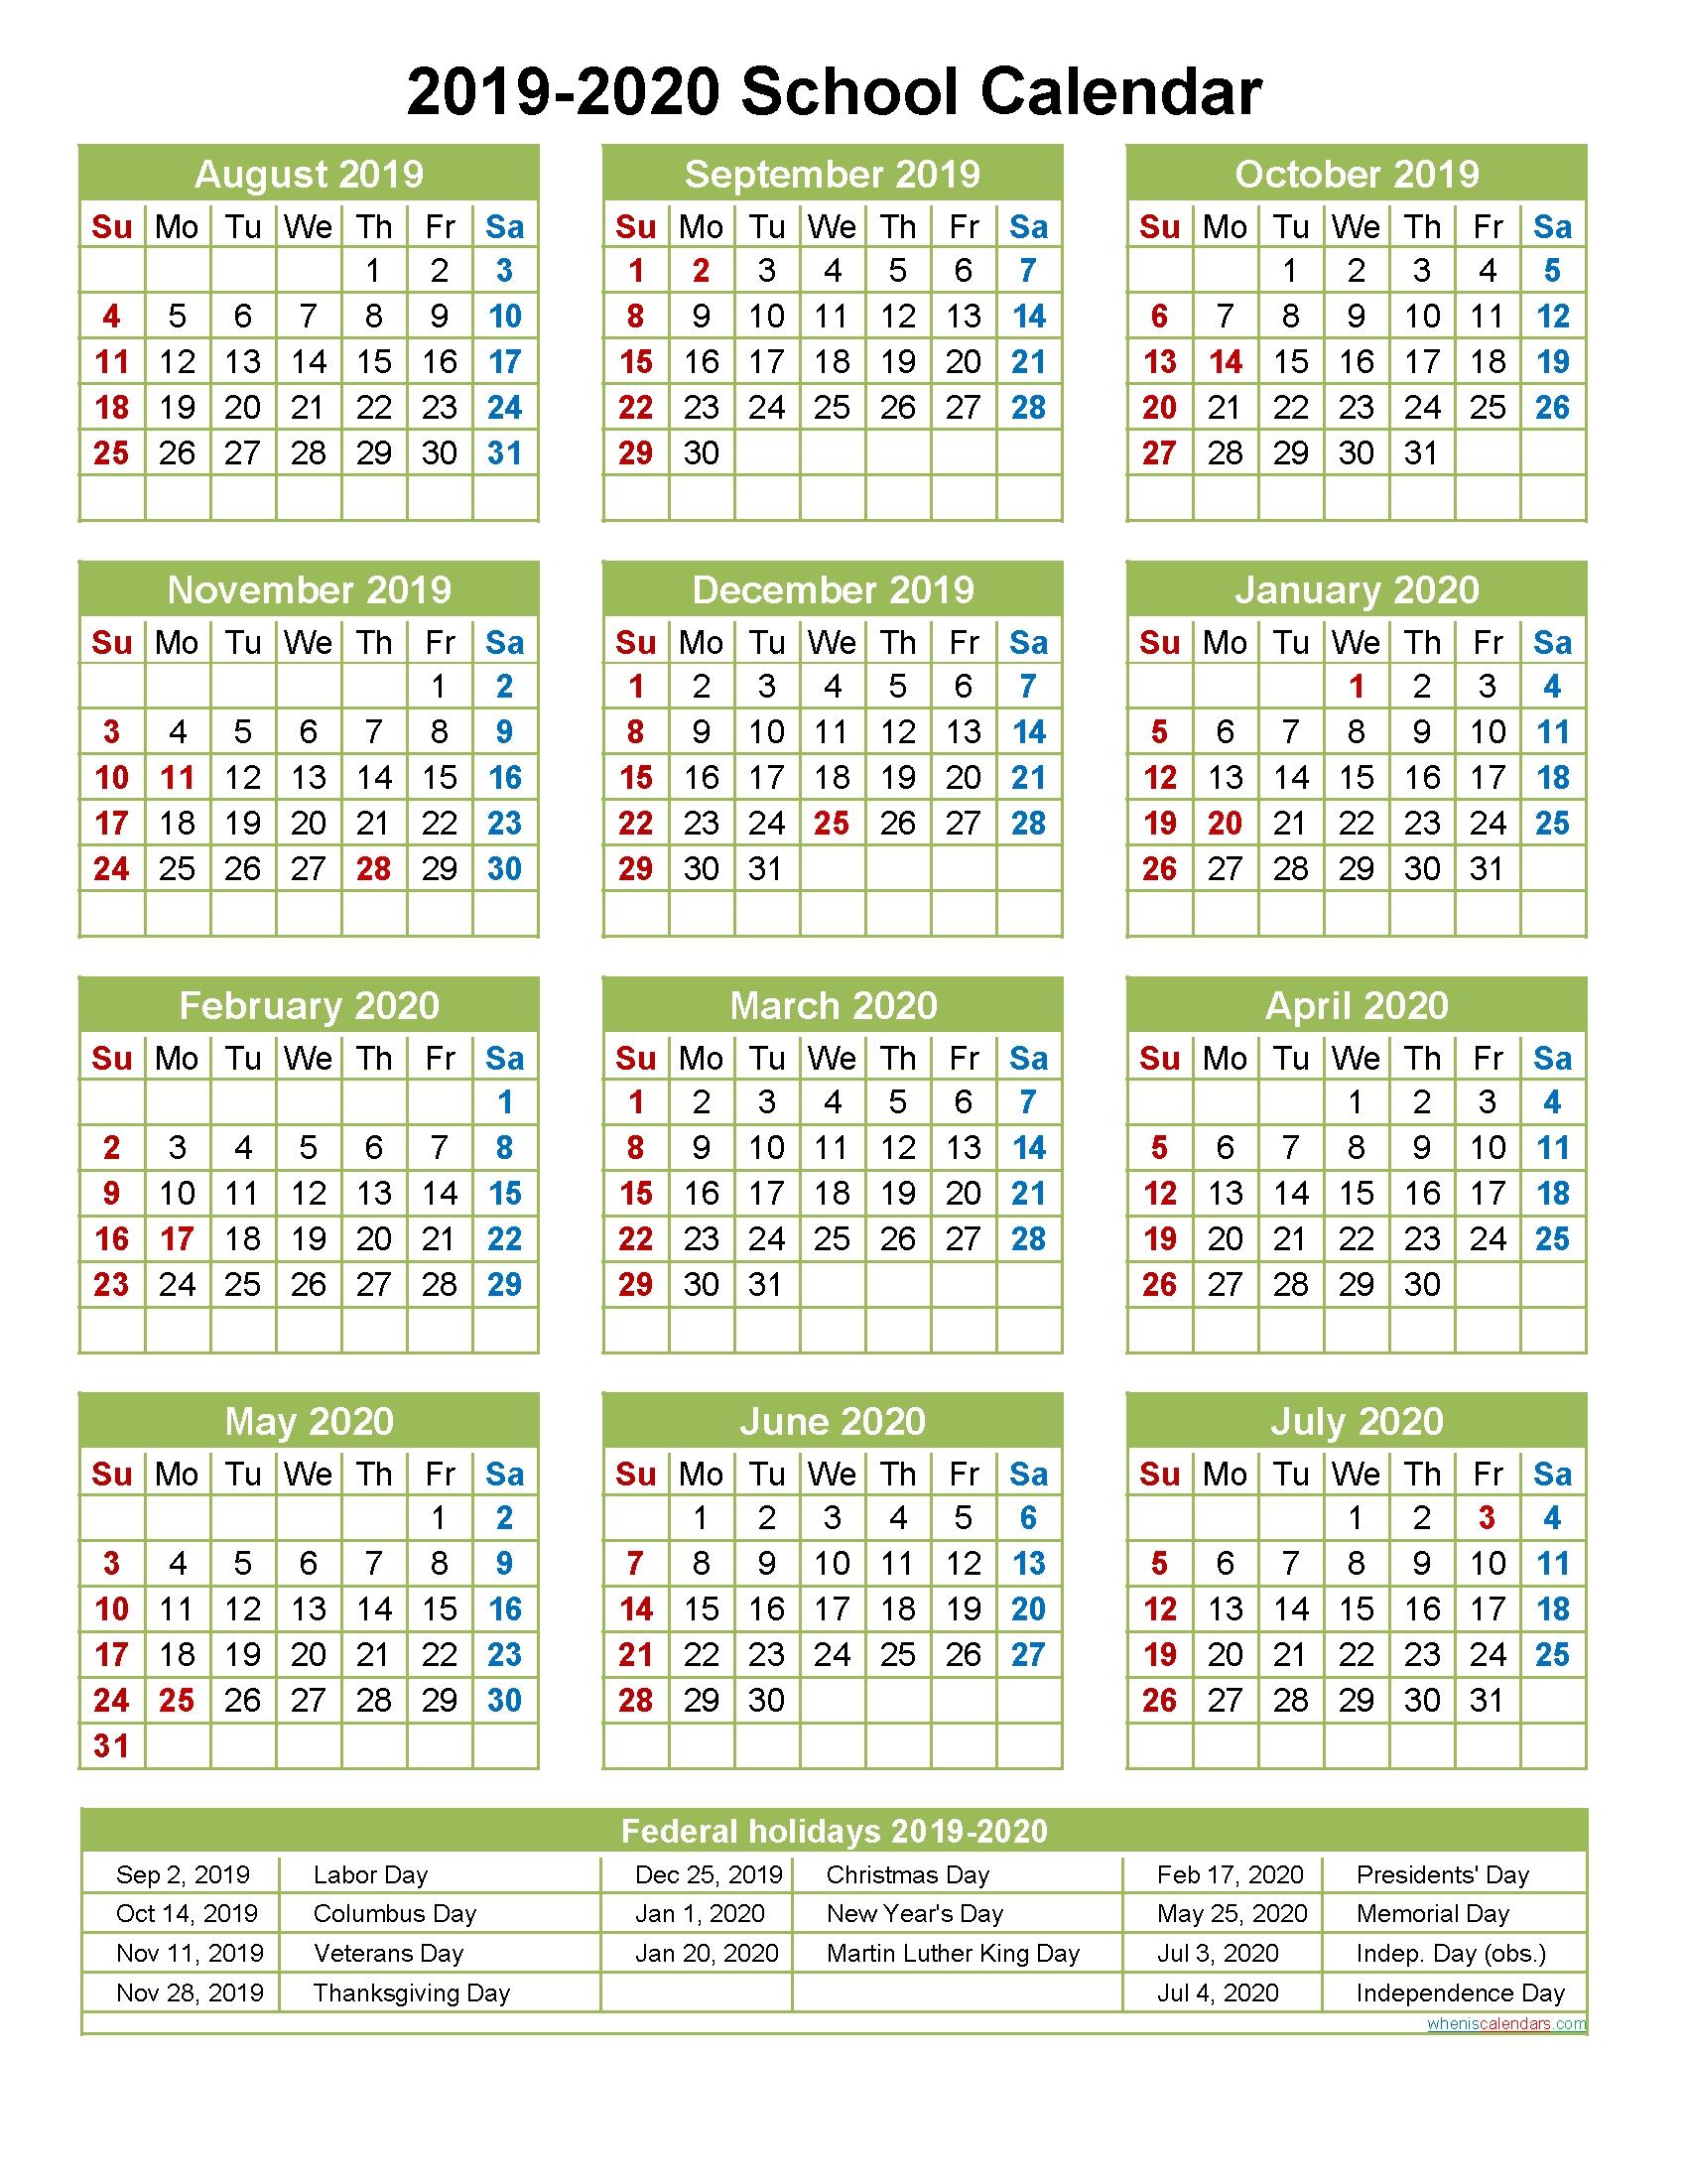 2019 And 2020 School Calendar Printable (Portrait